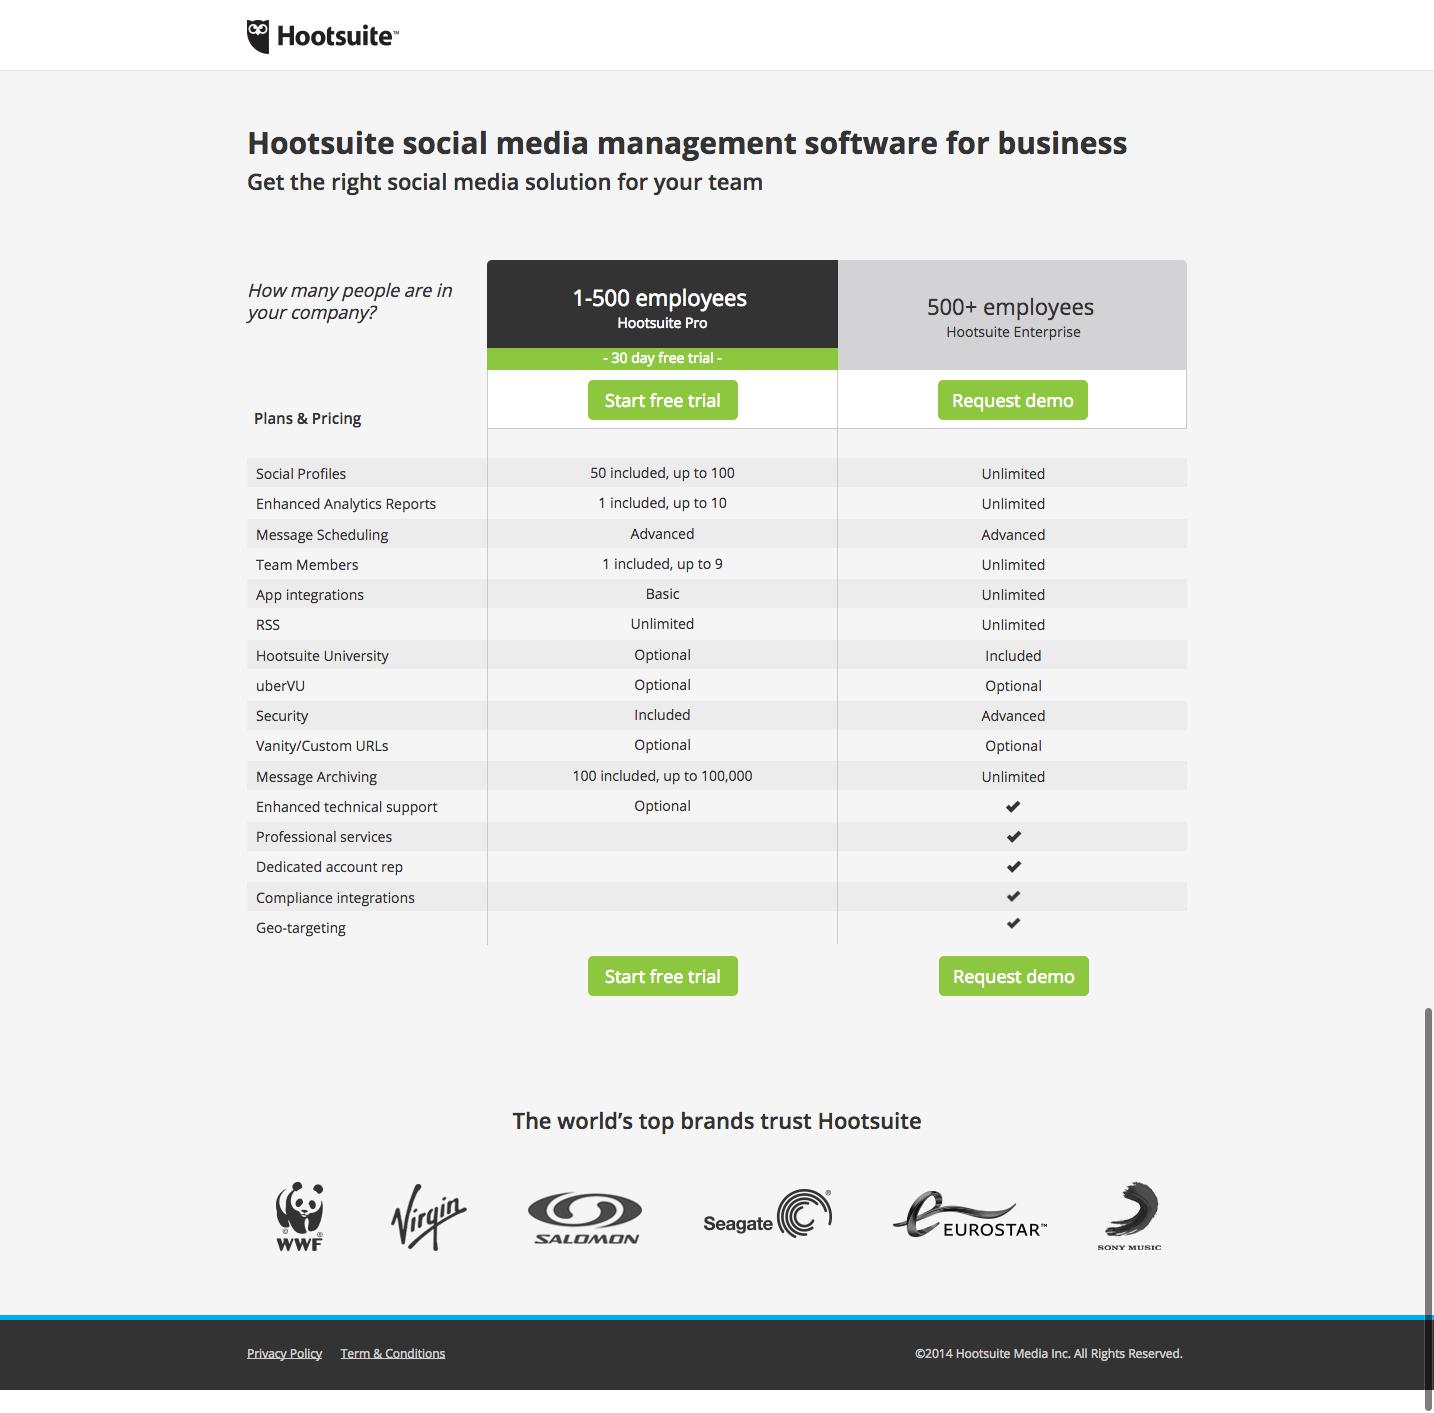 Hootsuite social media management software for business